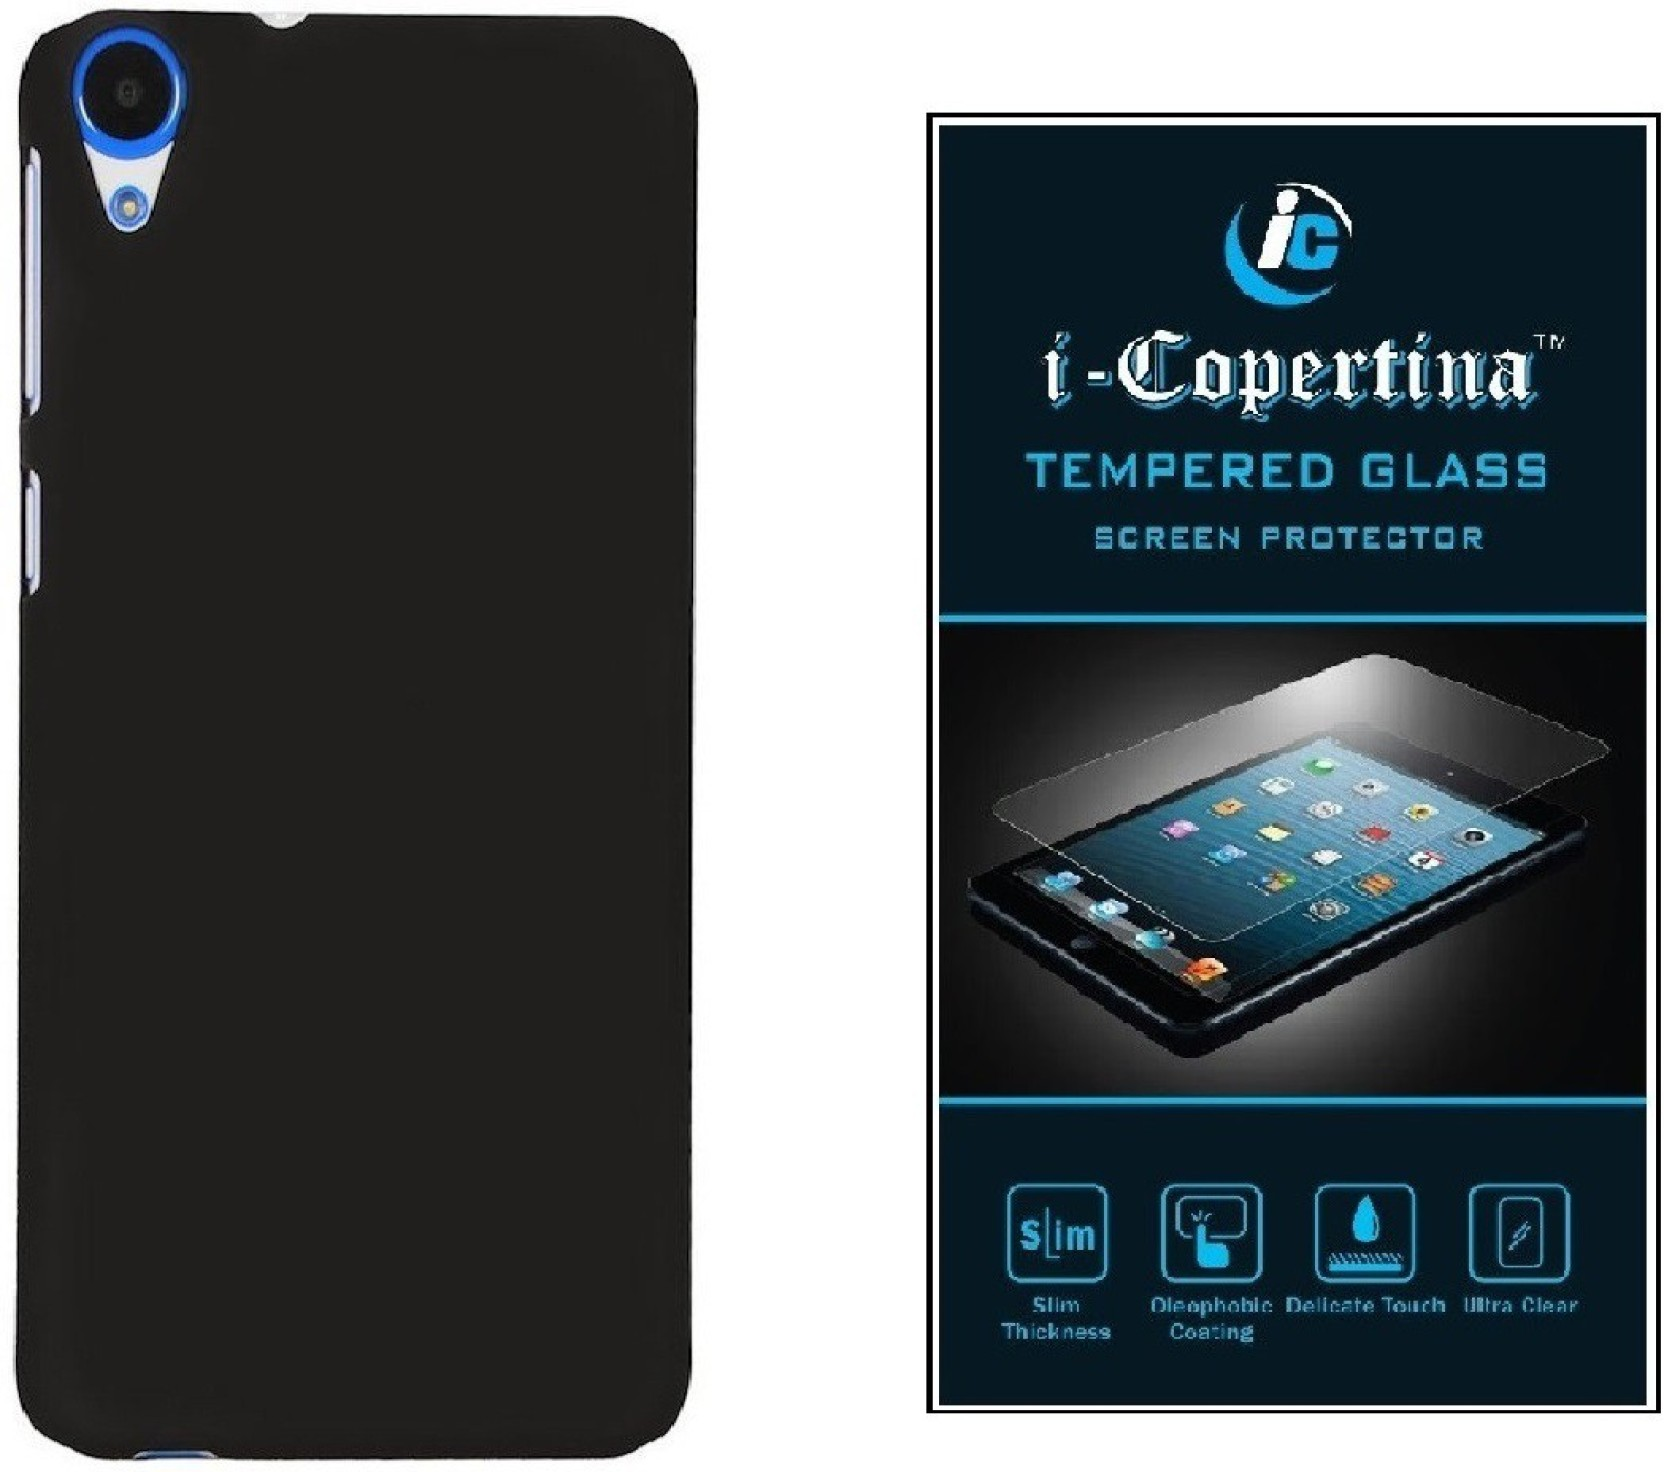 icopertina cover accessory combo for oppo a37 oppo a37f